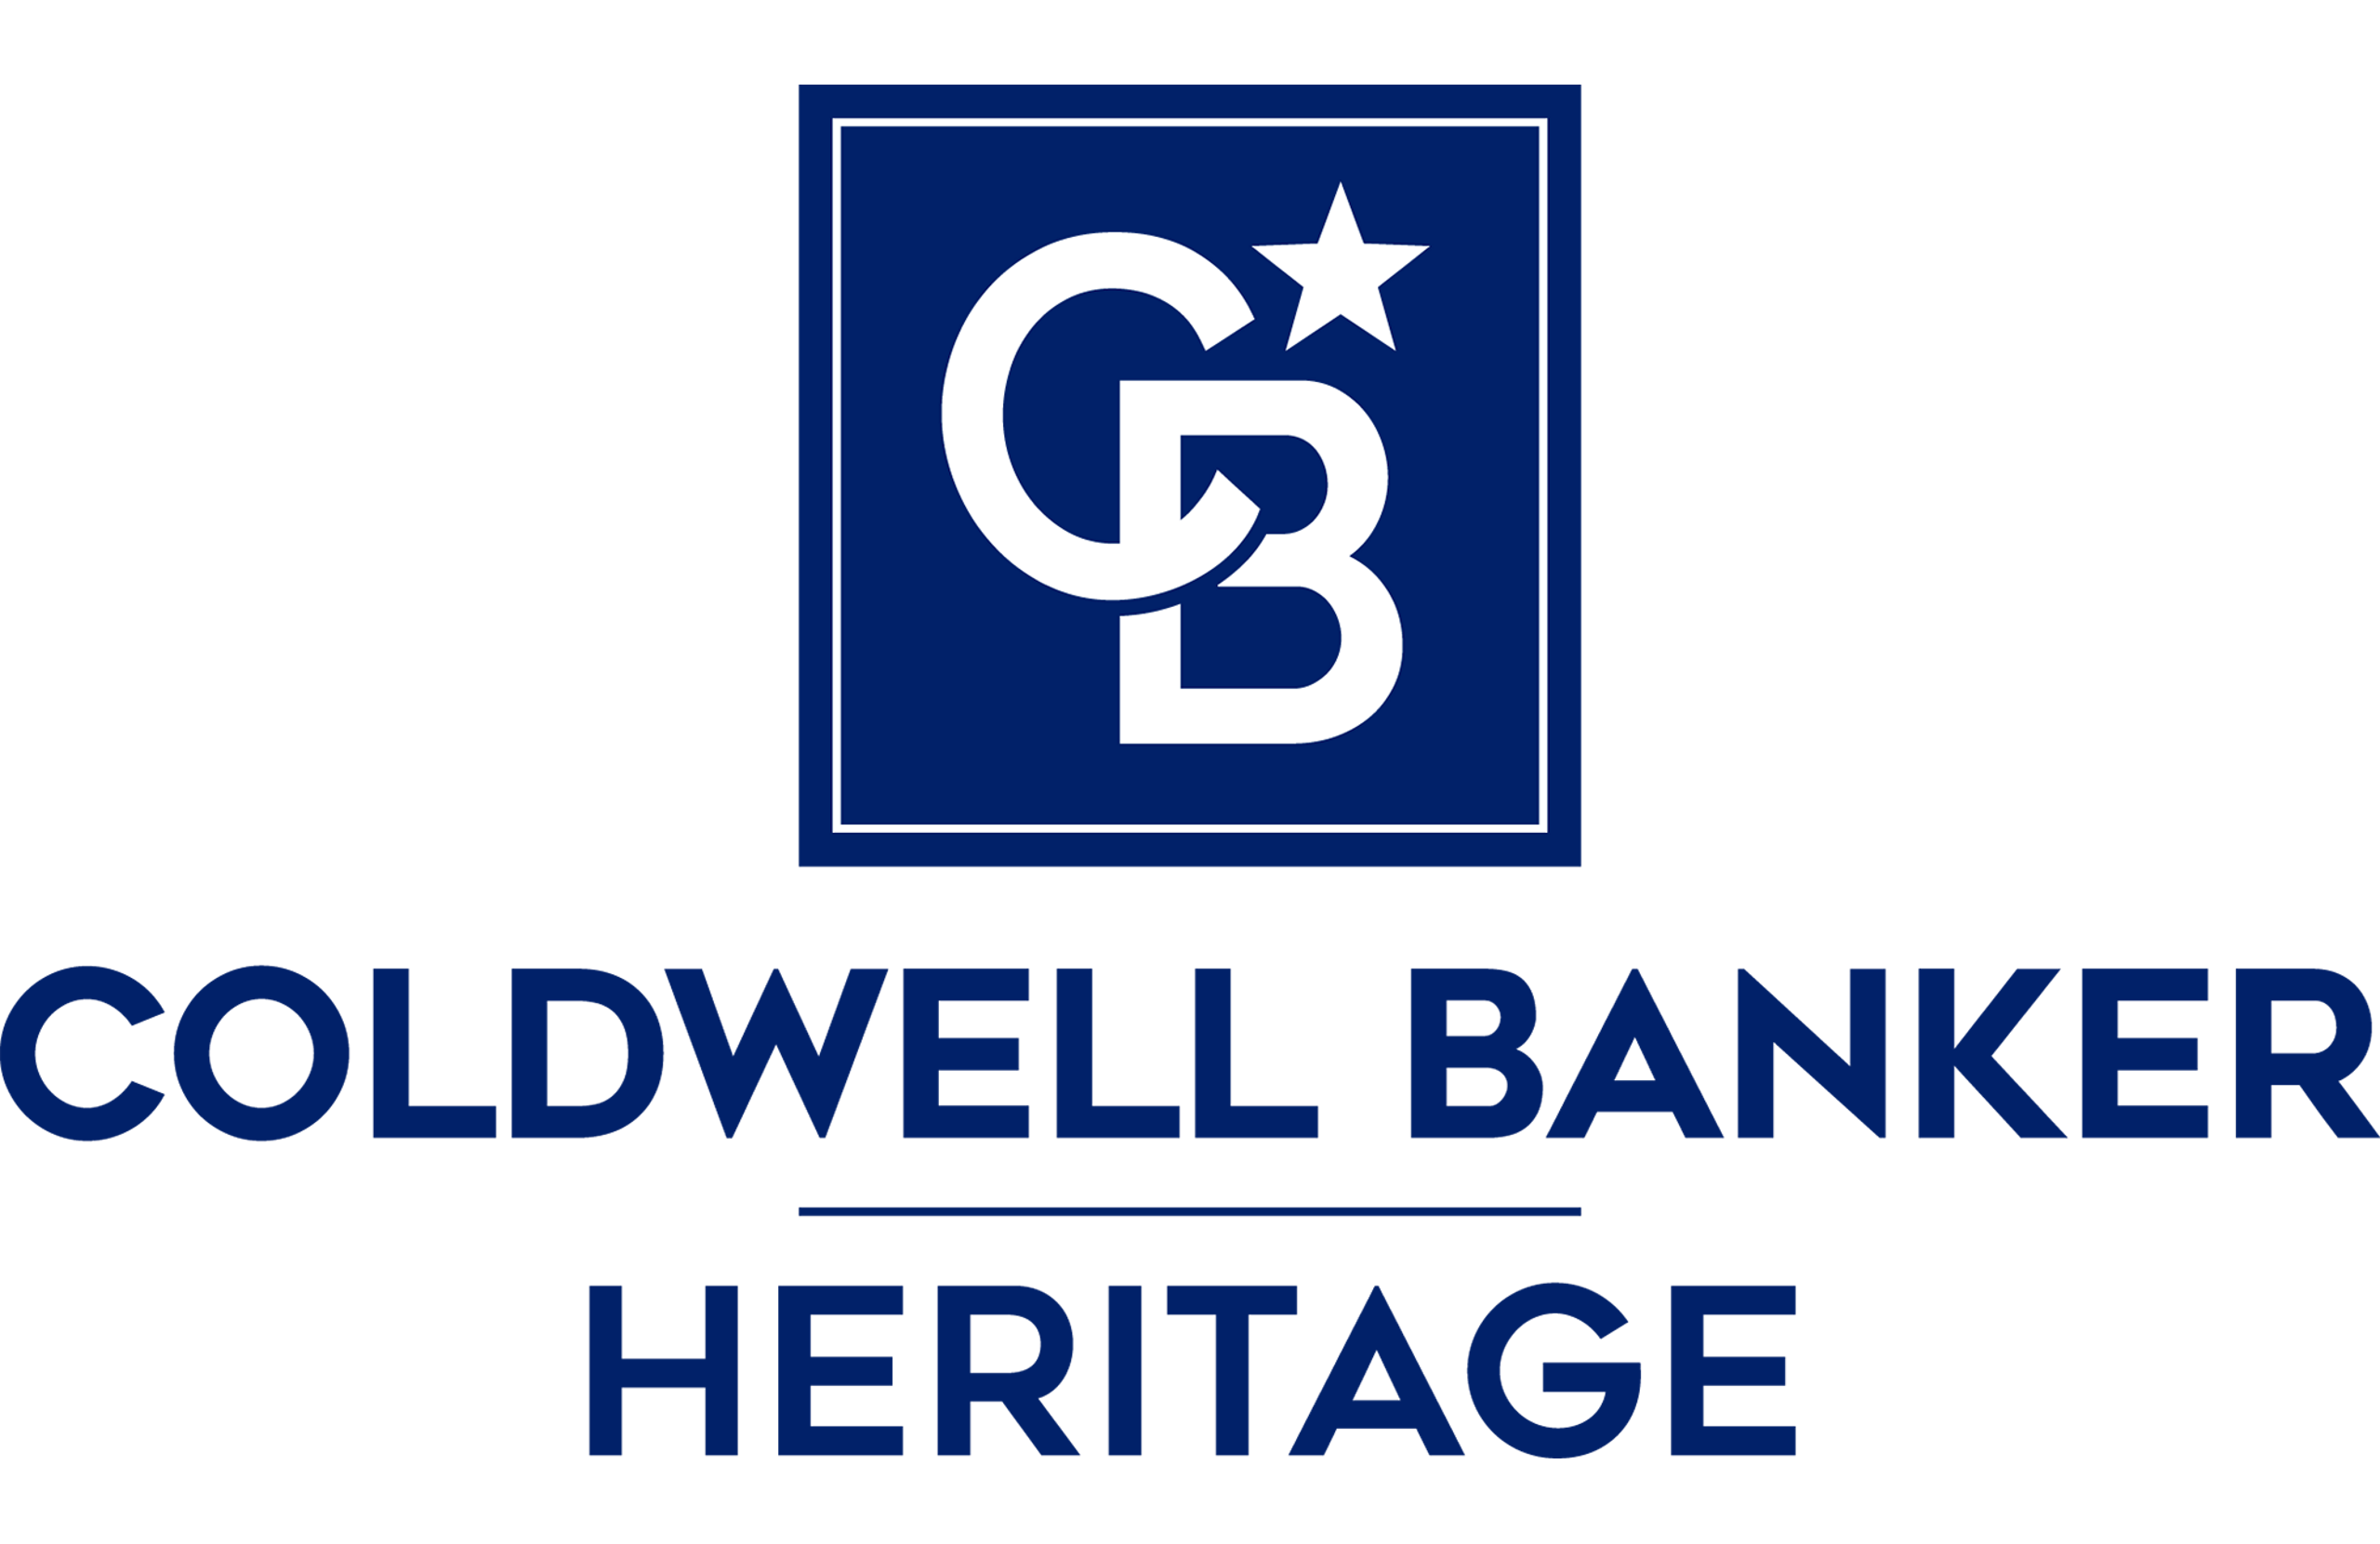 Laura Bettinger - - Coldwell Banker Heritage Logo